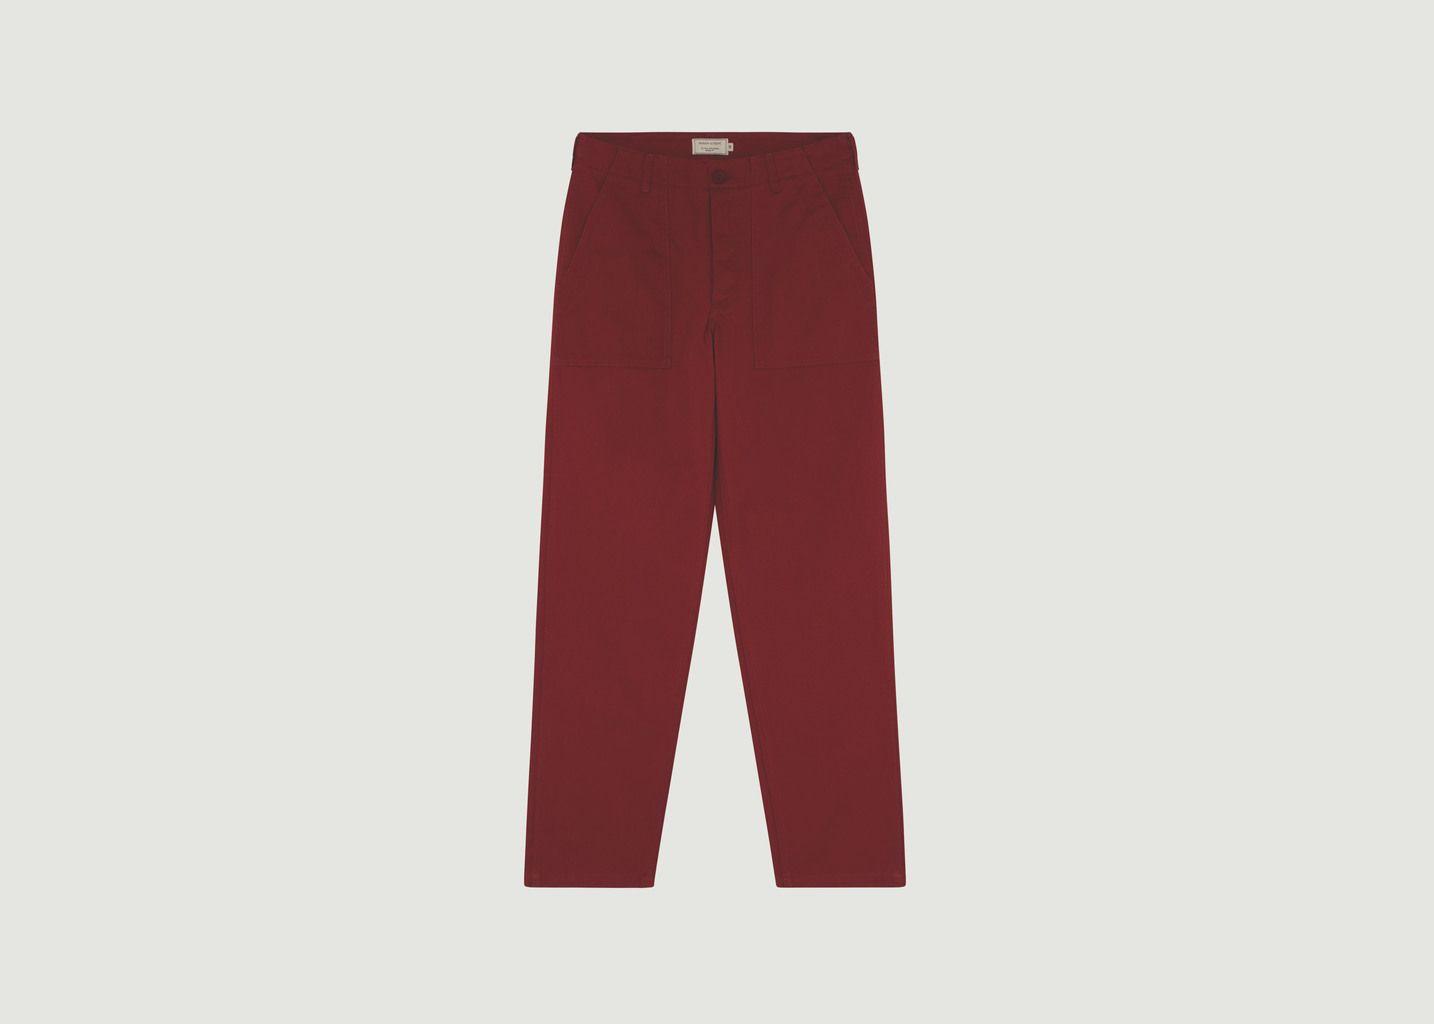 Pantalon Worker - Maison Kitsuné